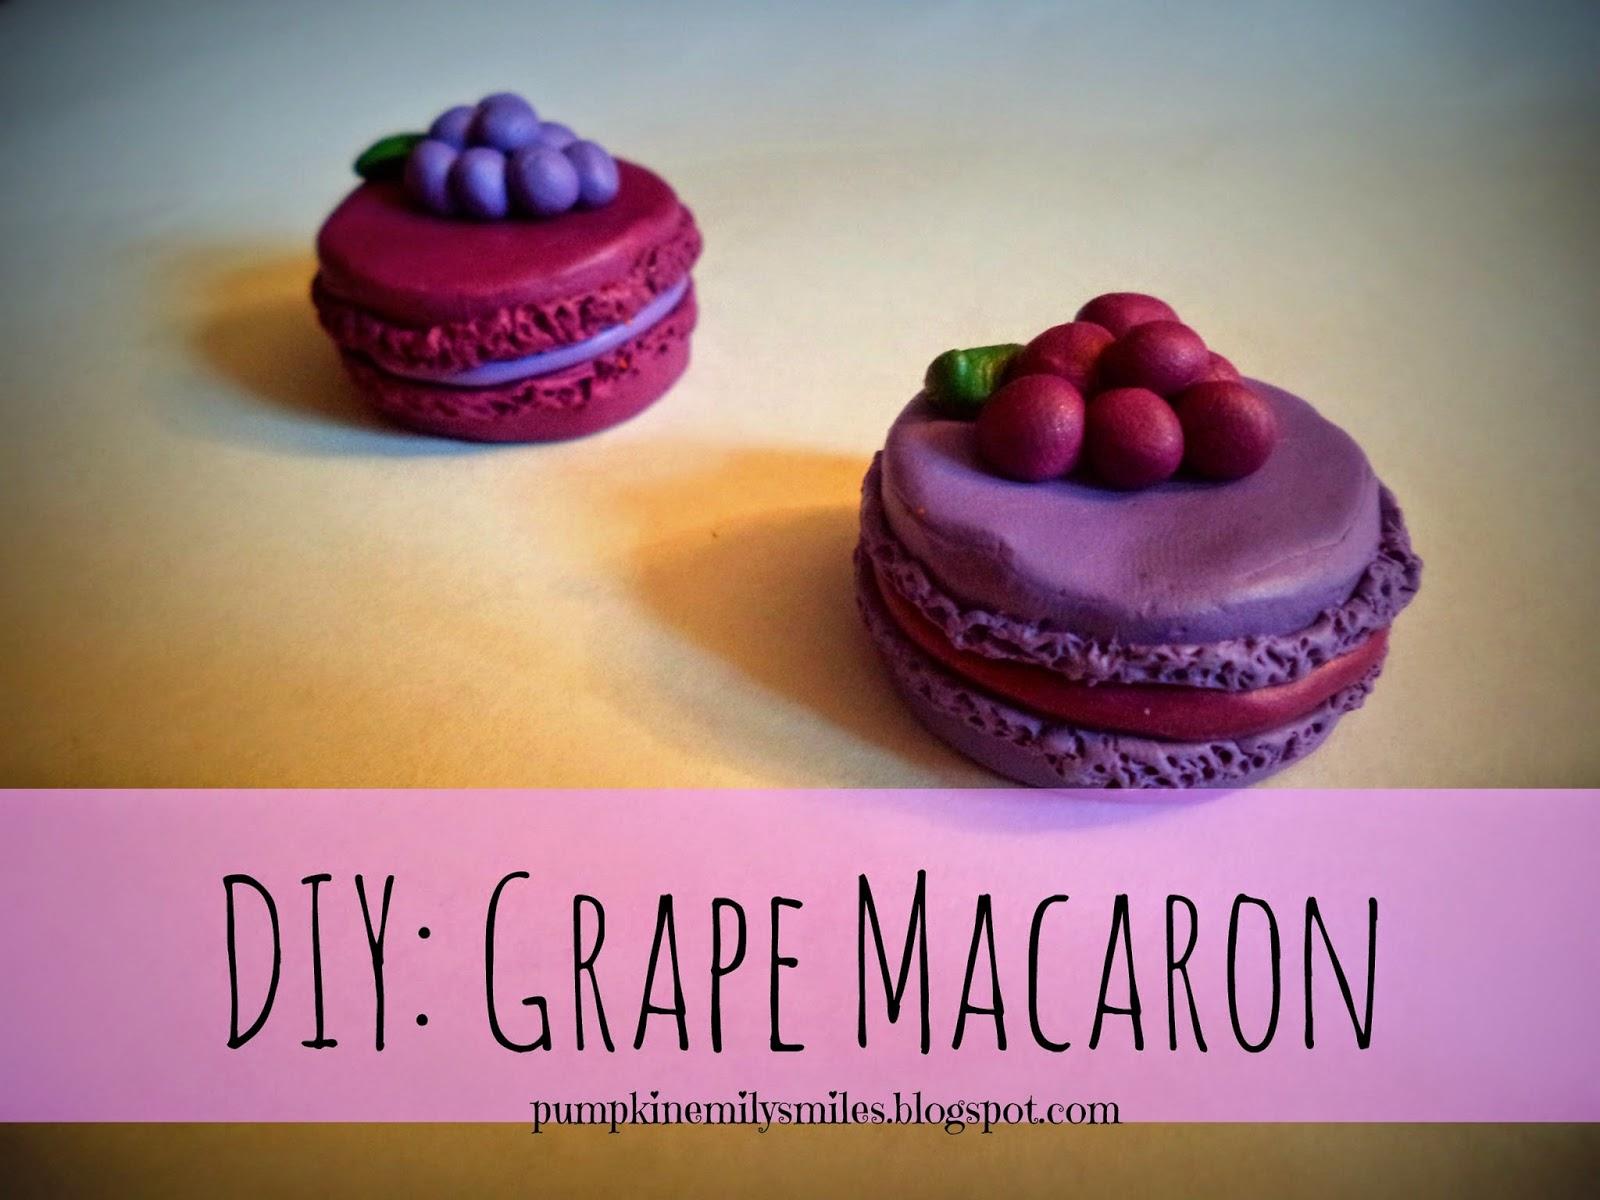 DIY: Grape Macaron